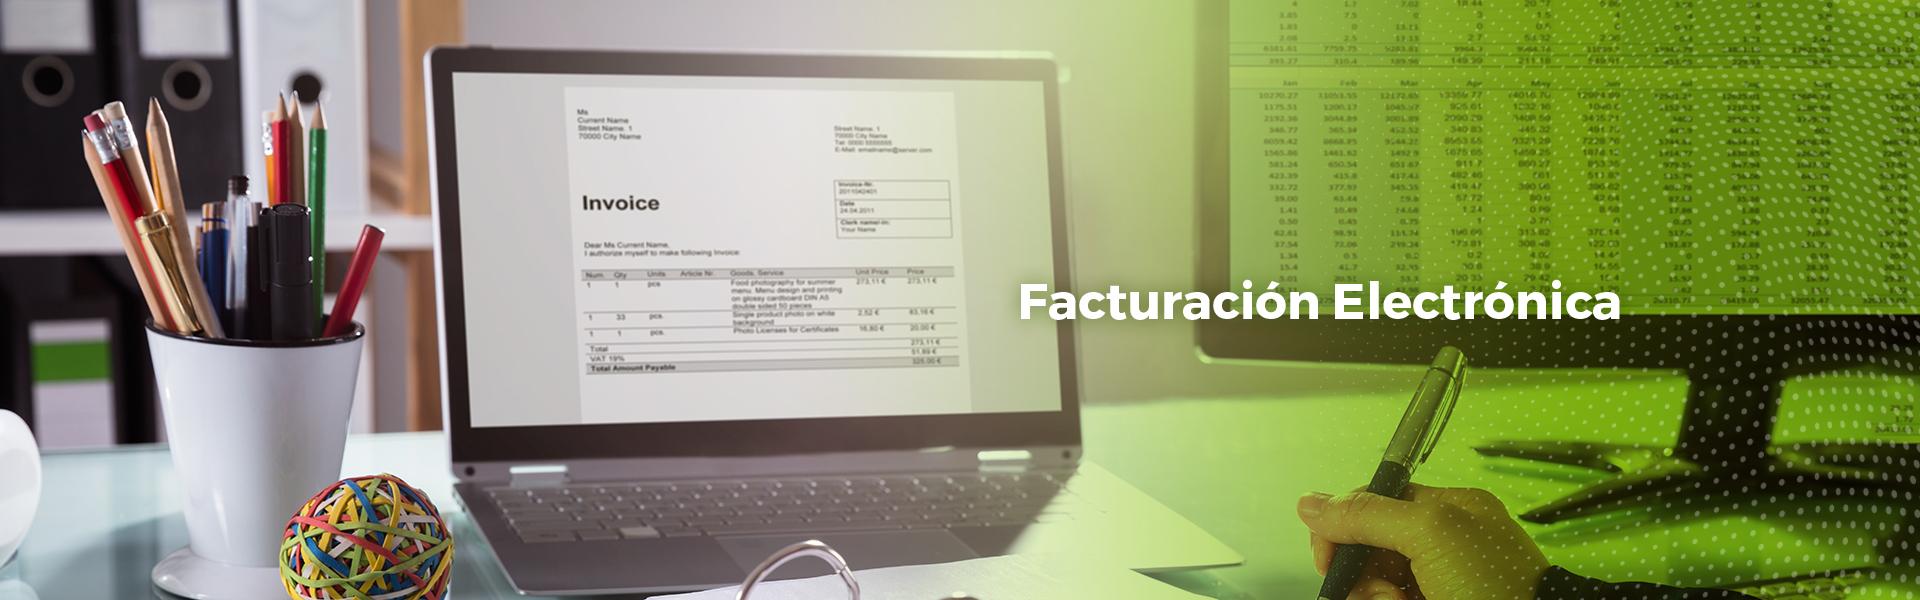 slide-facturacion-electronica